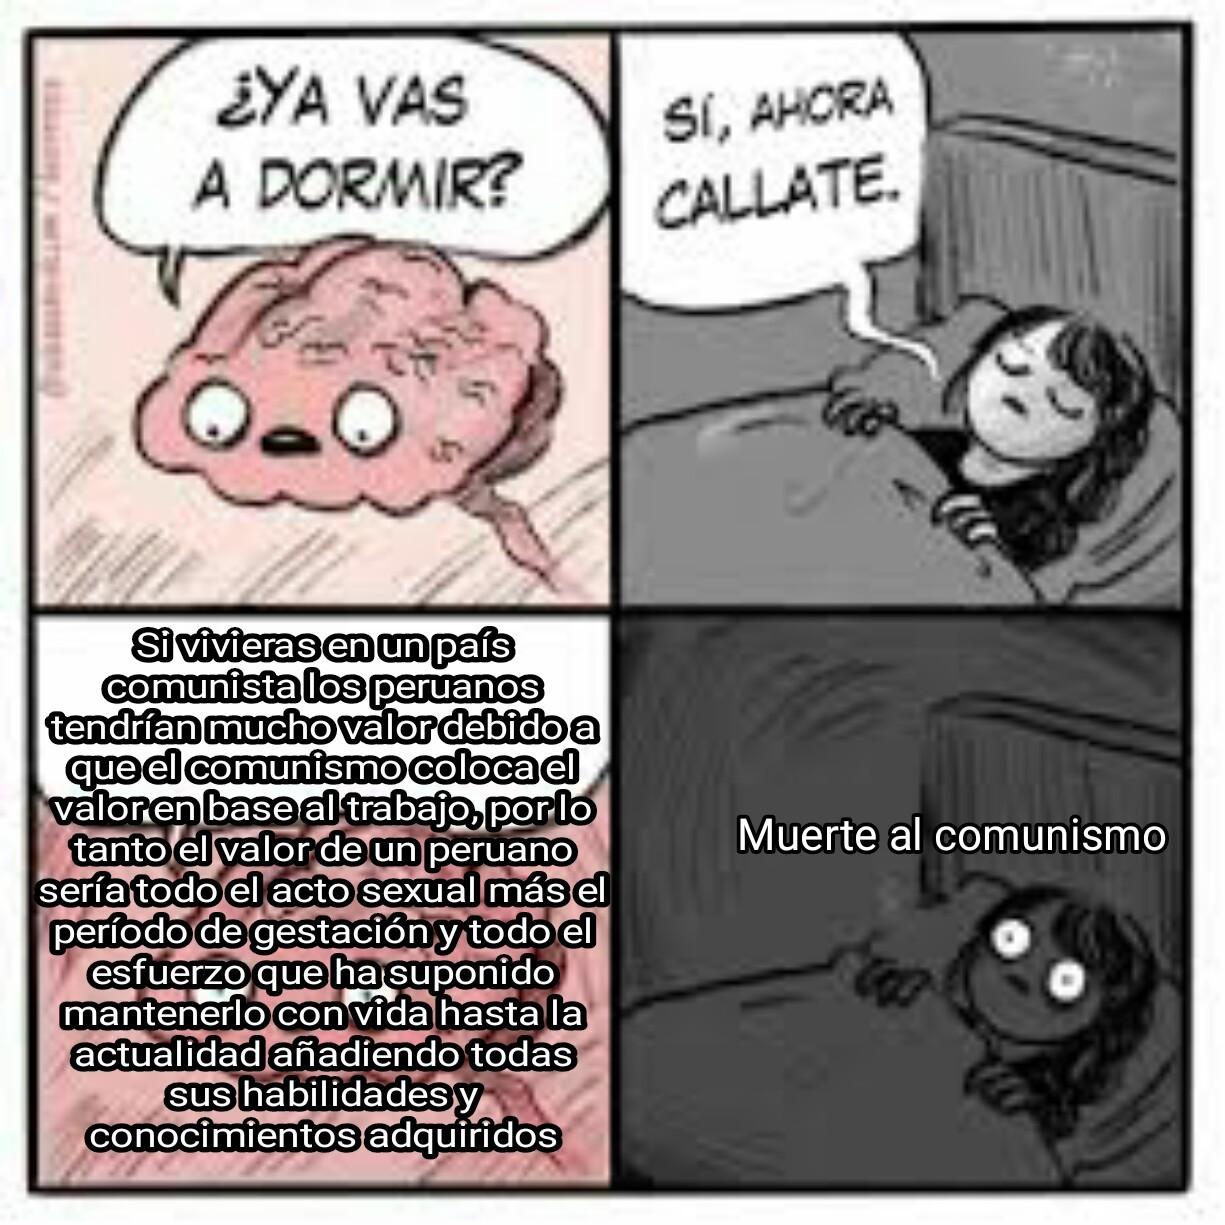 Marx le dió valor a los peruanos OMG - meme